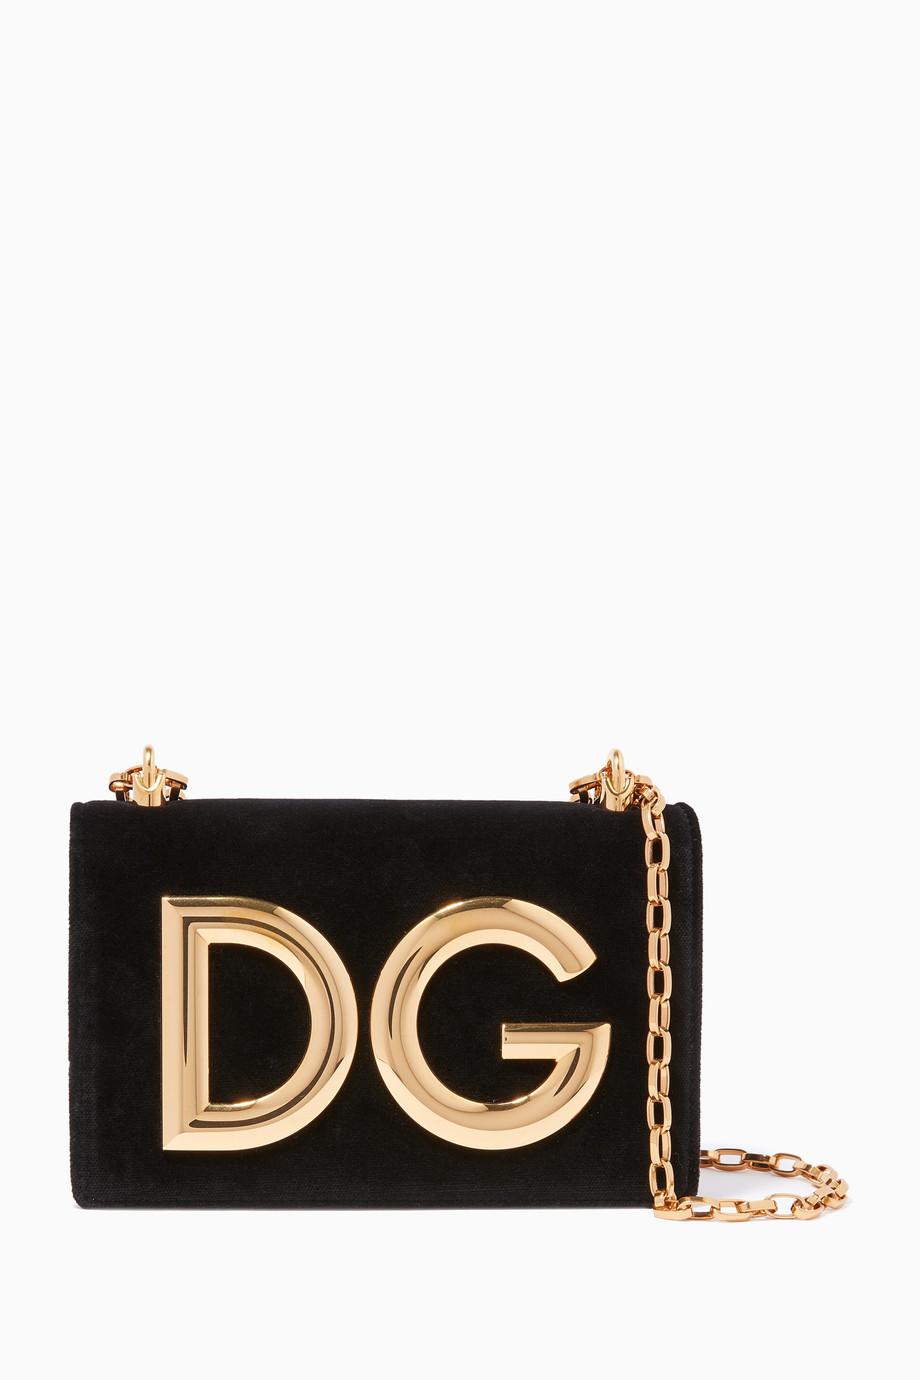 a06051850b8d Shop Dolce & Gabbana Black Black Velvet DG Girls Chain Shoulder Bag ...